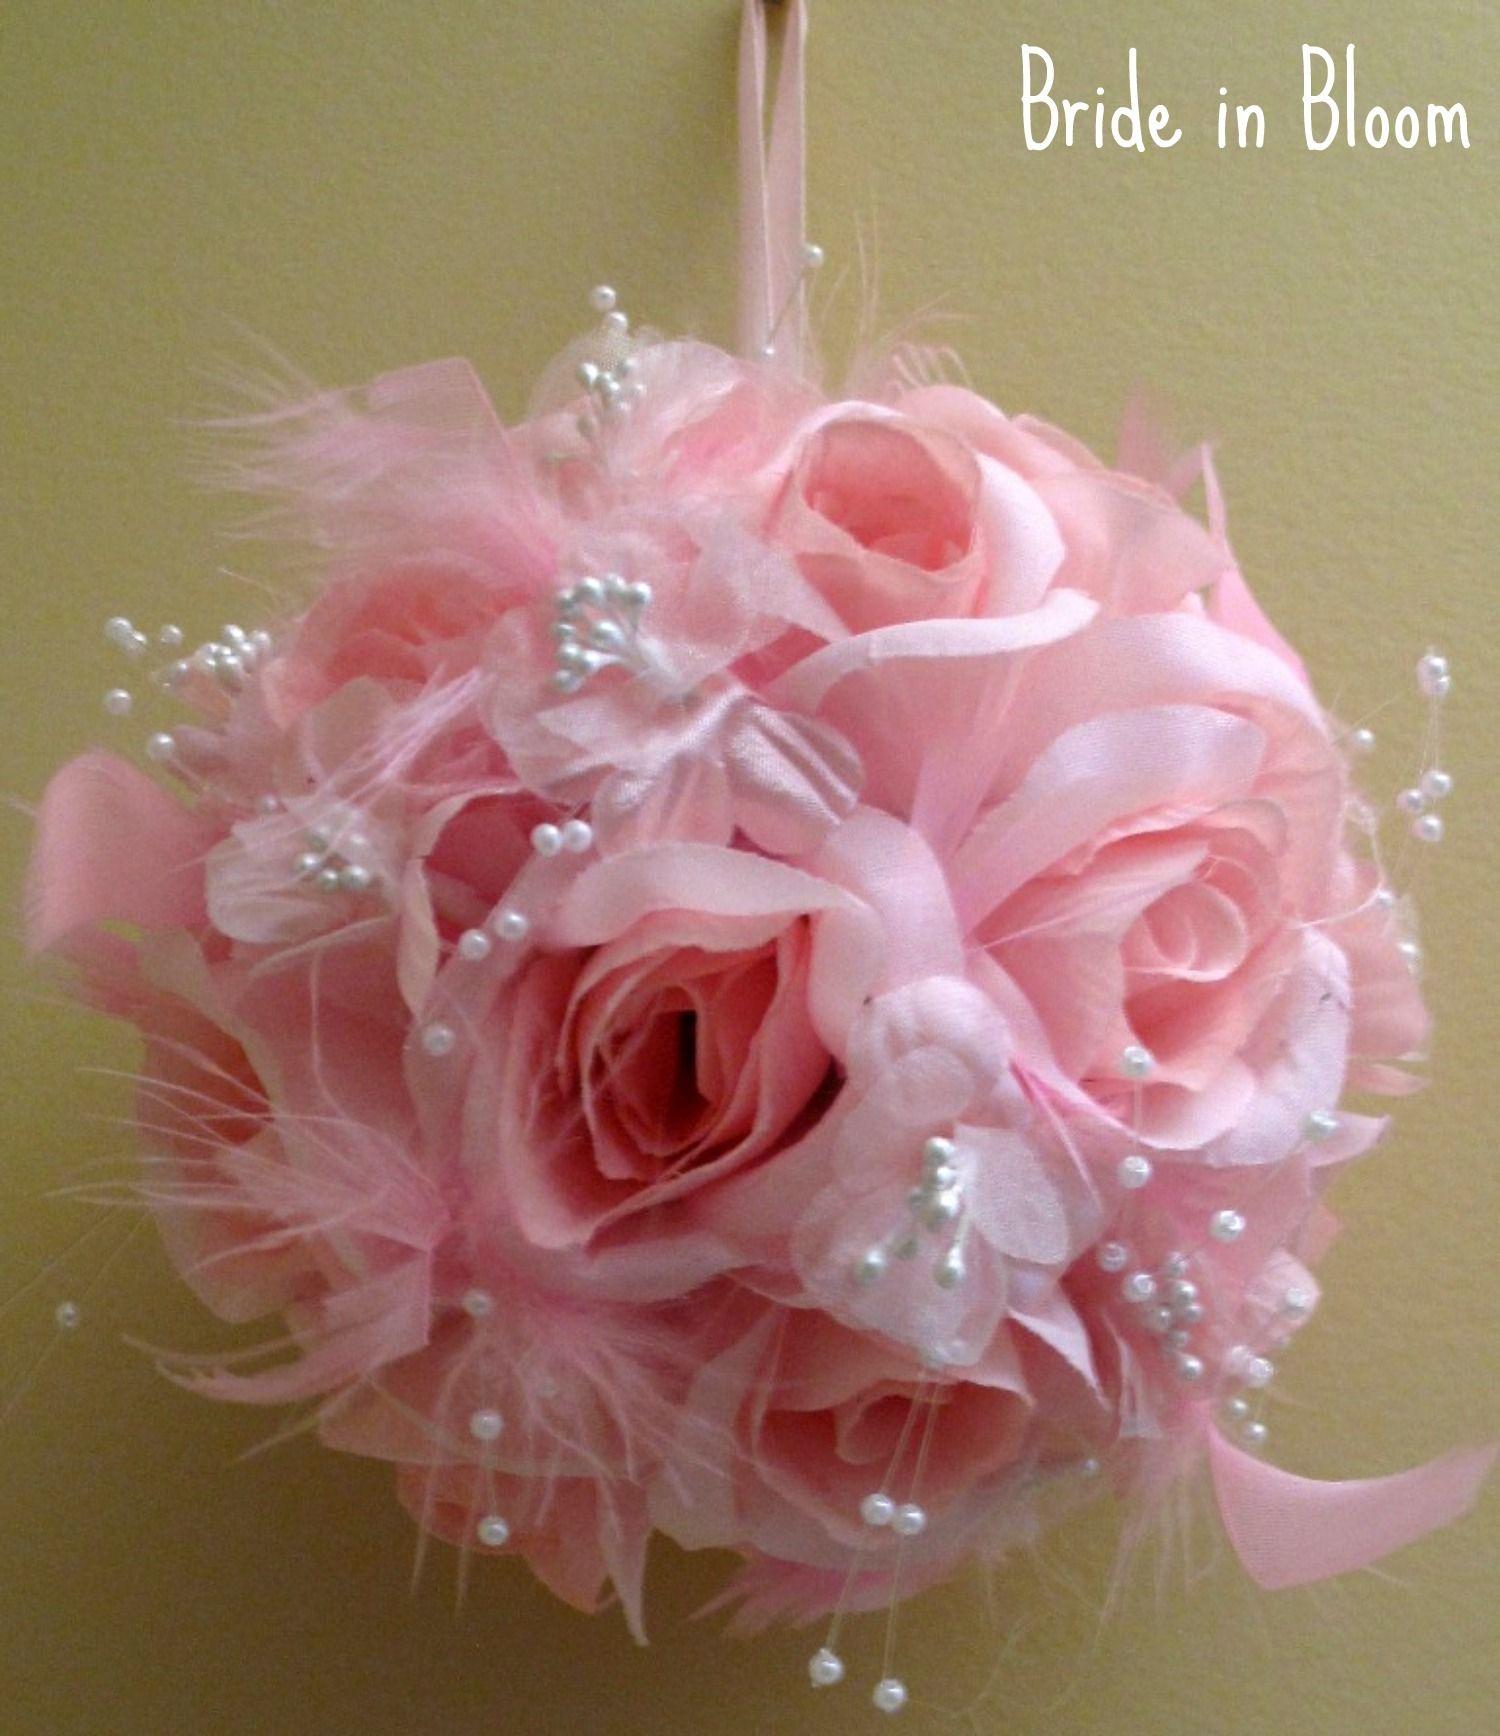 kissing balls for wedding decorations | Wedding flower balls ...